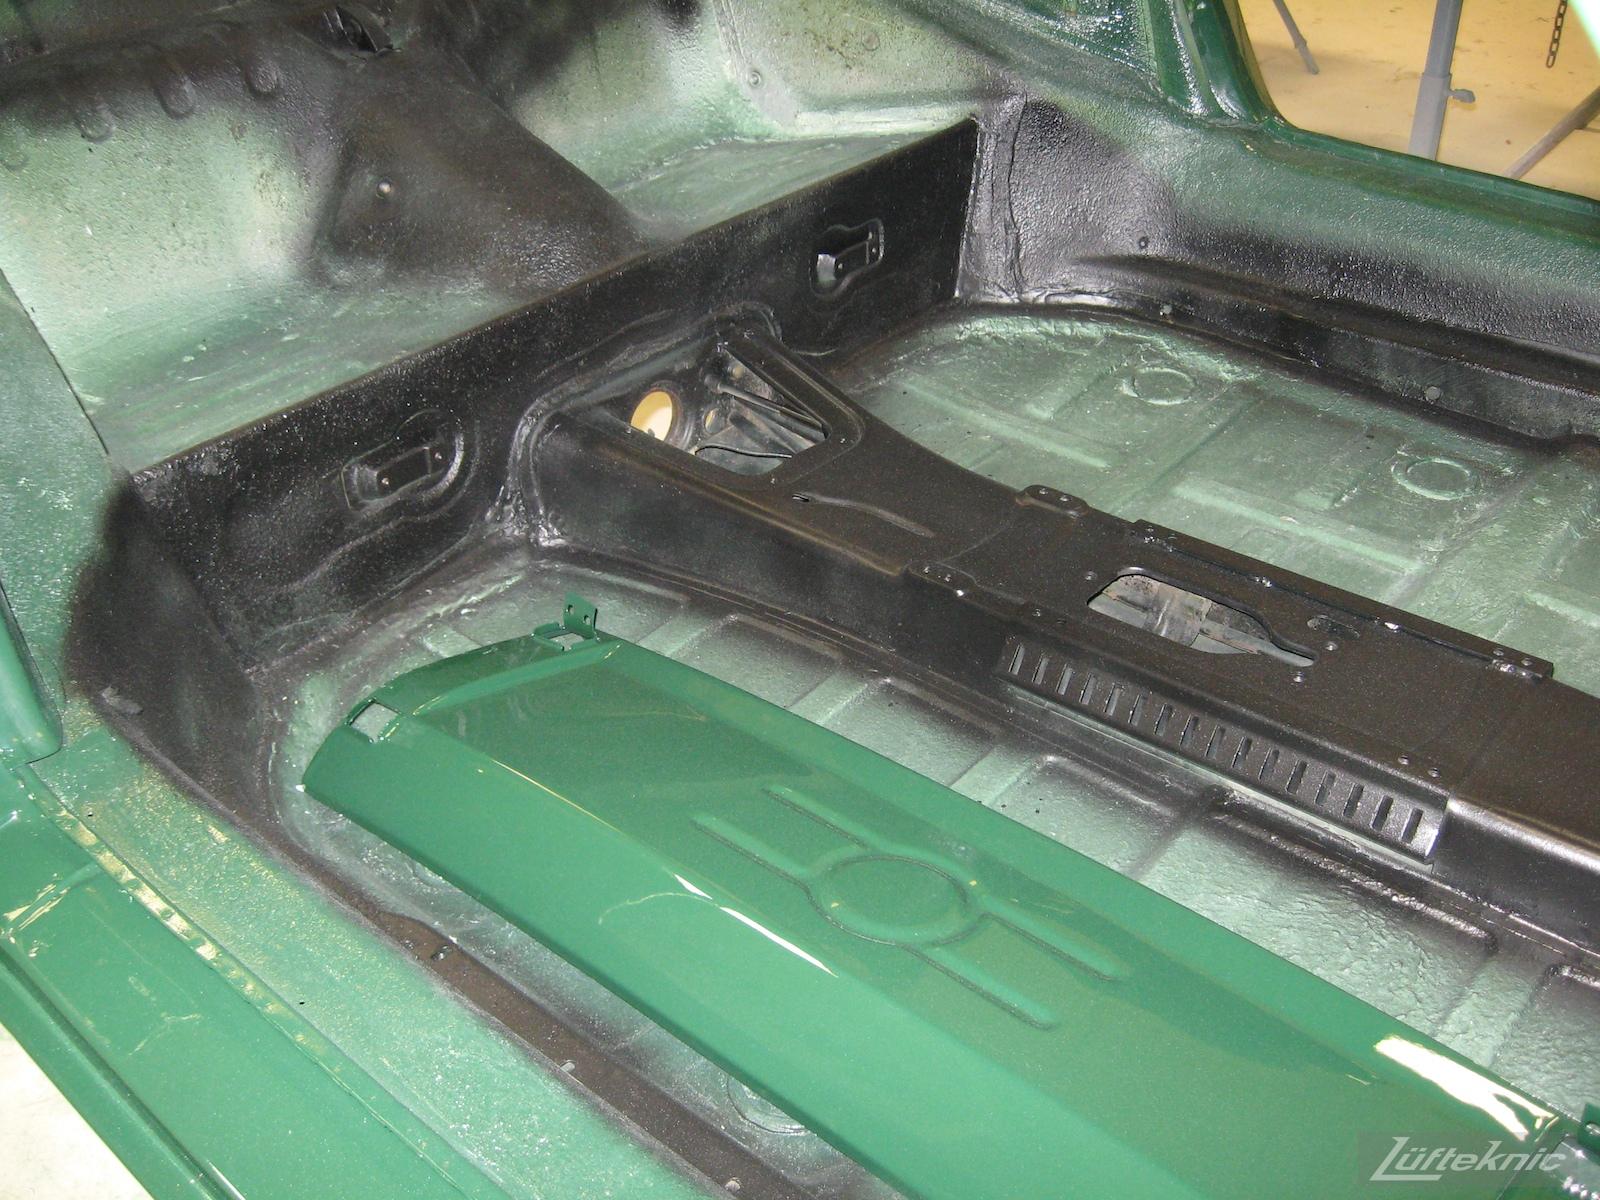 Body panel and floors of an Irish Green Porsche 912 undergoing restoration at Lufteknic.